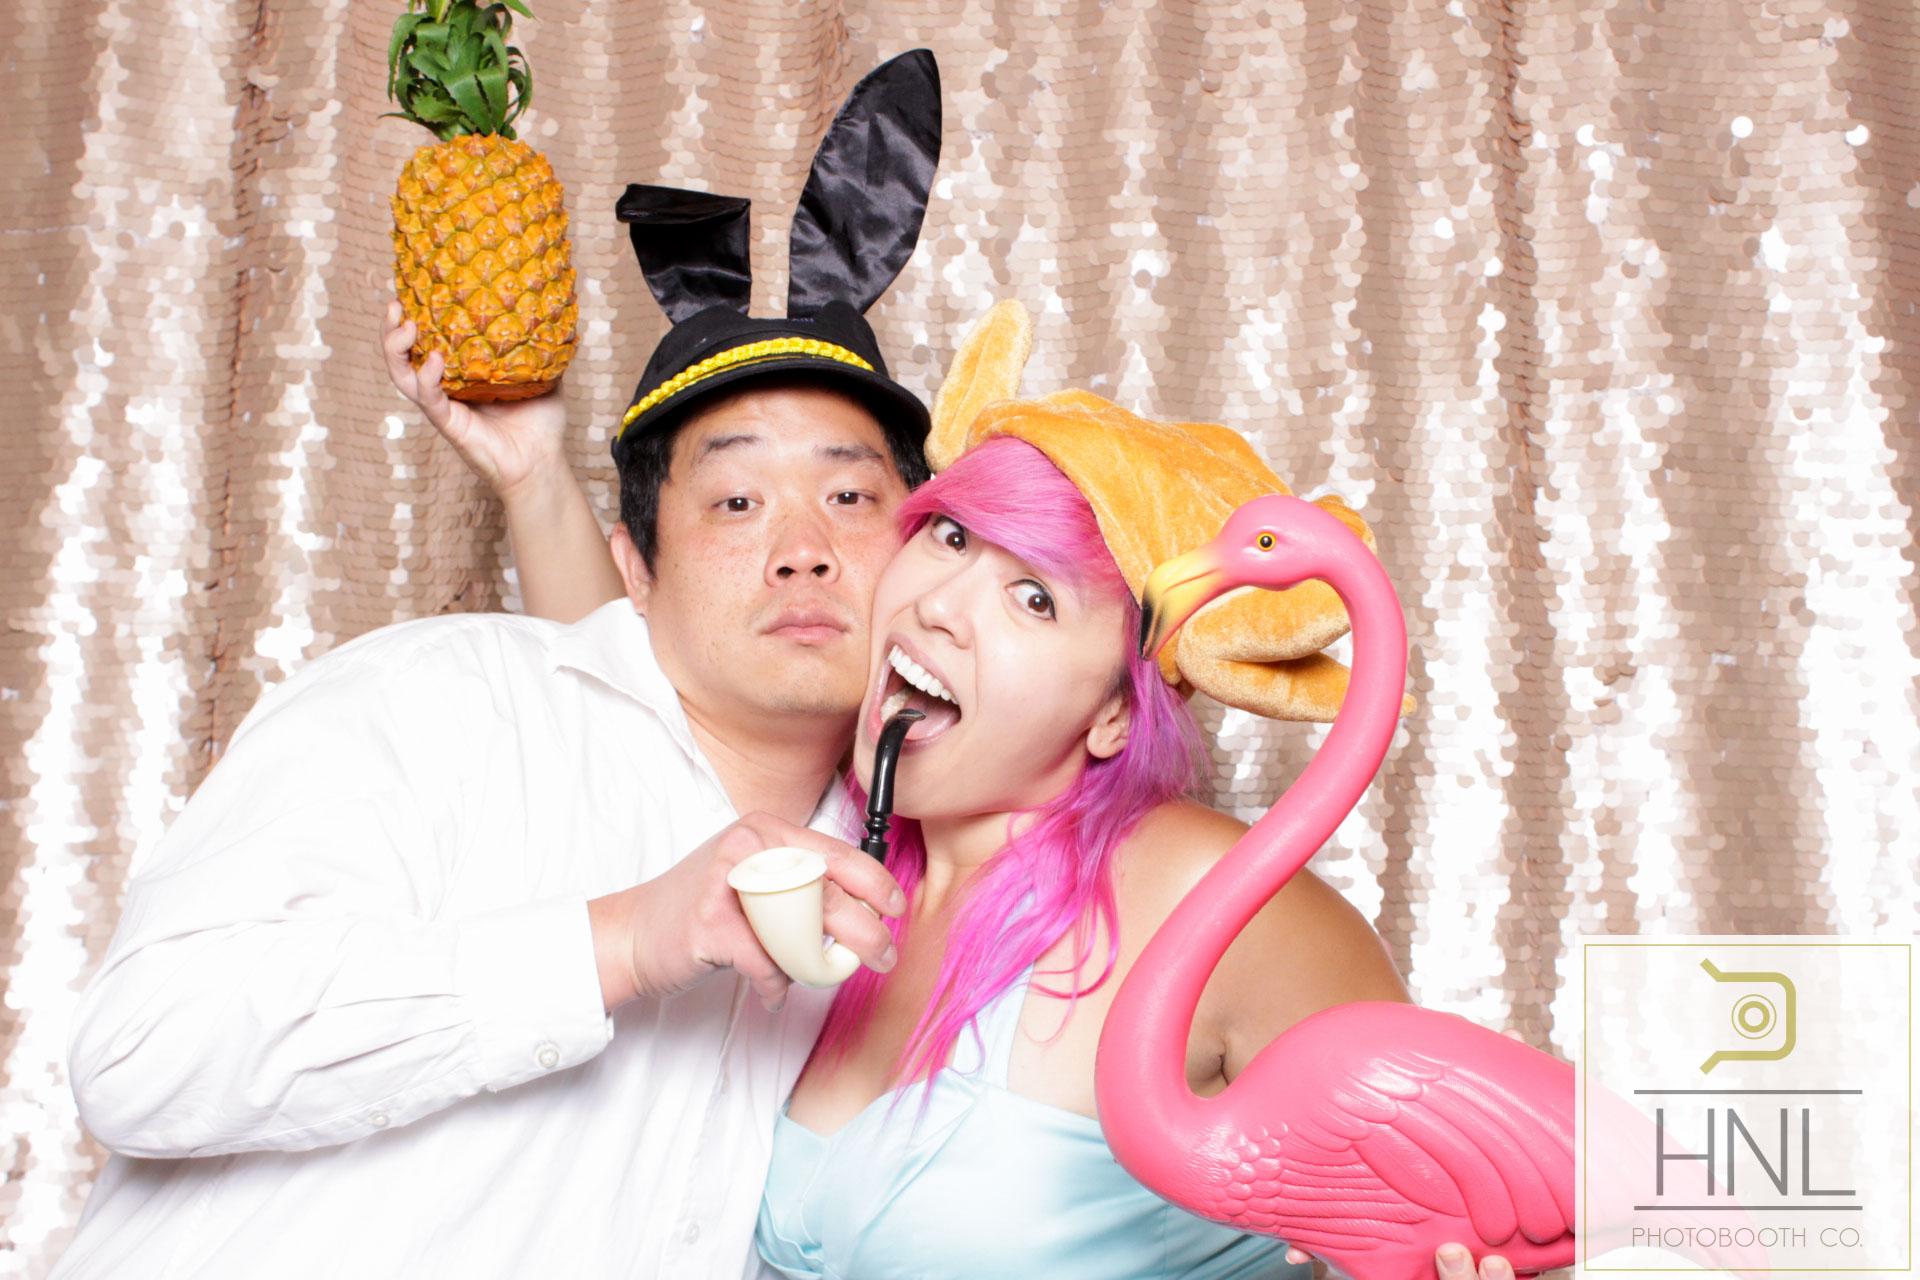 Helen and Ryan Wedding Photo Booth The Halekulani Hotel Waikiki Oahu Hawaii (44 of 154).jpg